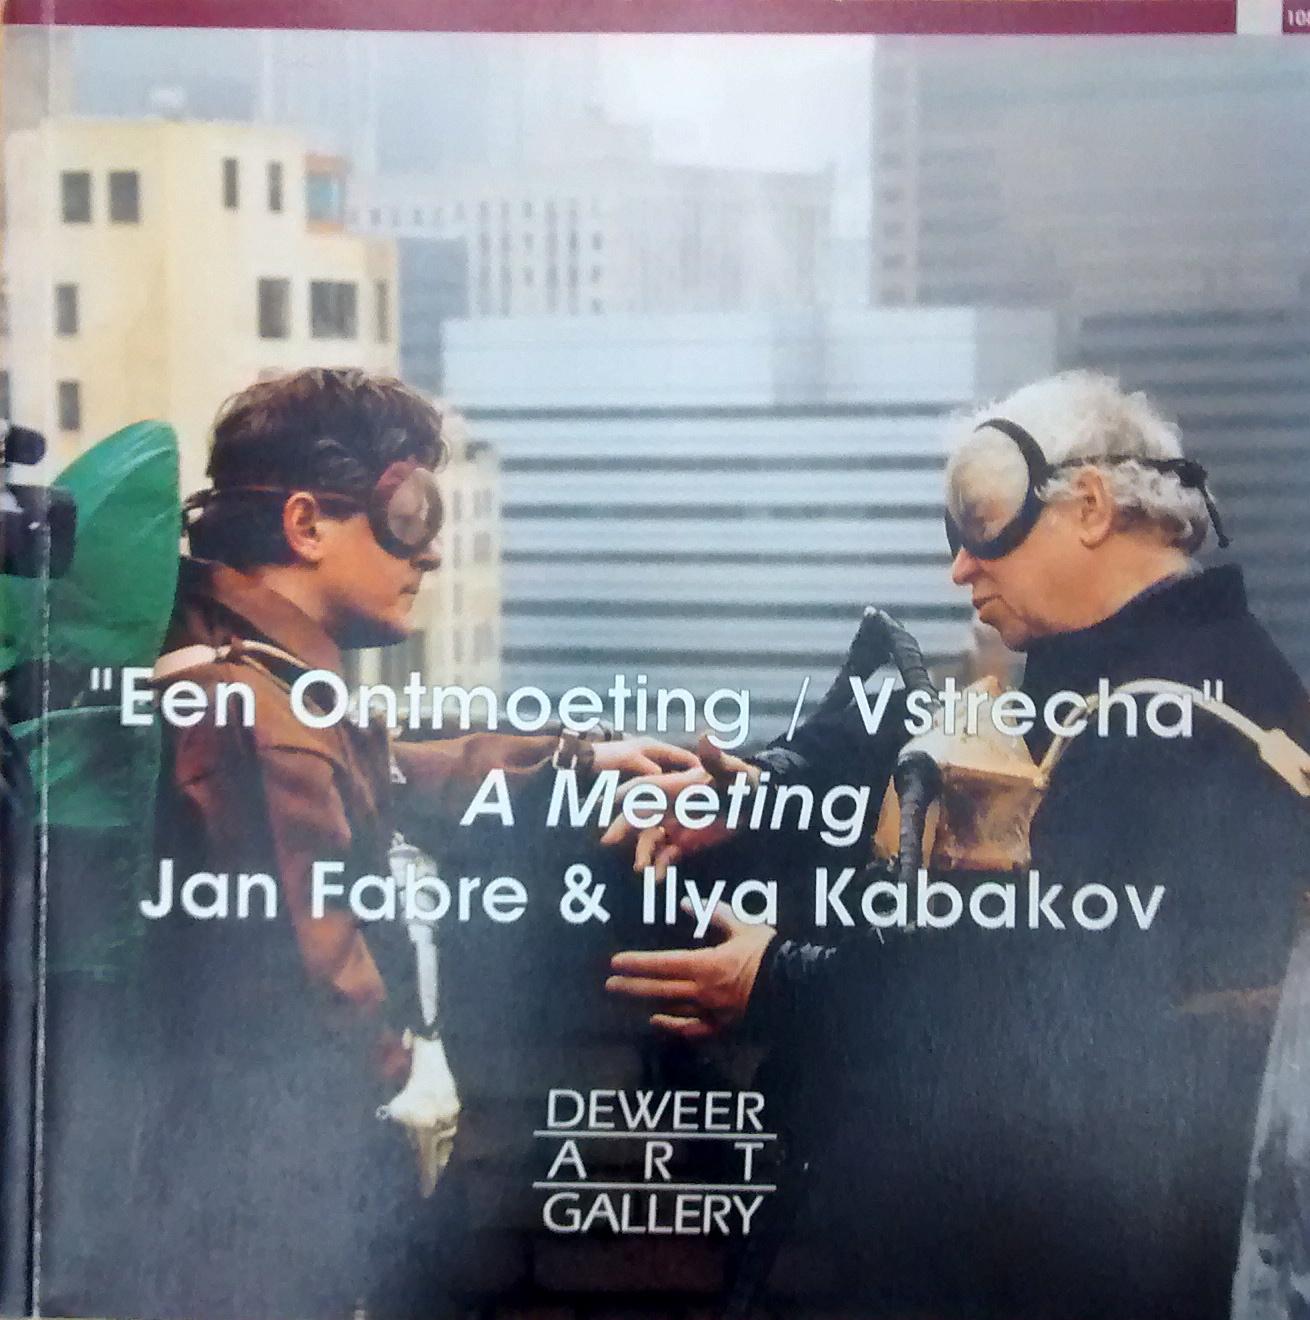 Een Ontmoeting / Vstrecha. A Meeting – Jan Fabre & Ilya Kabakov